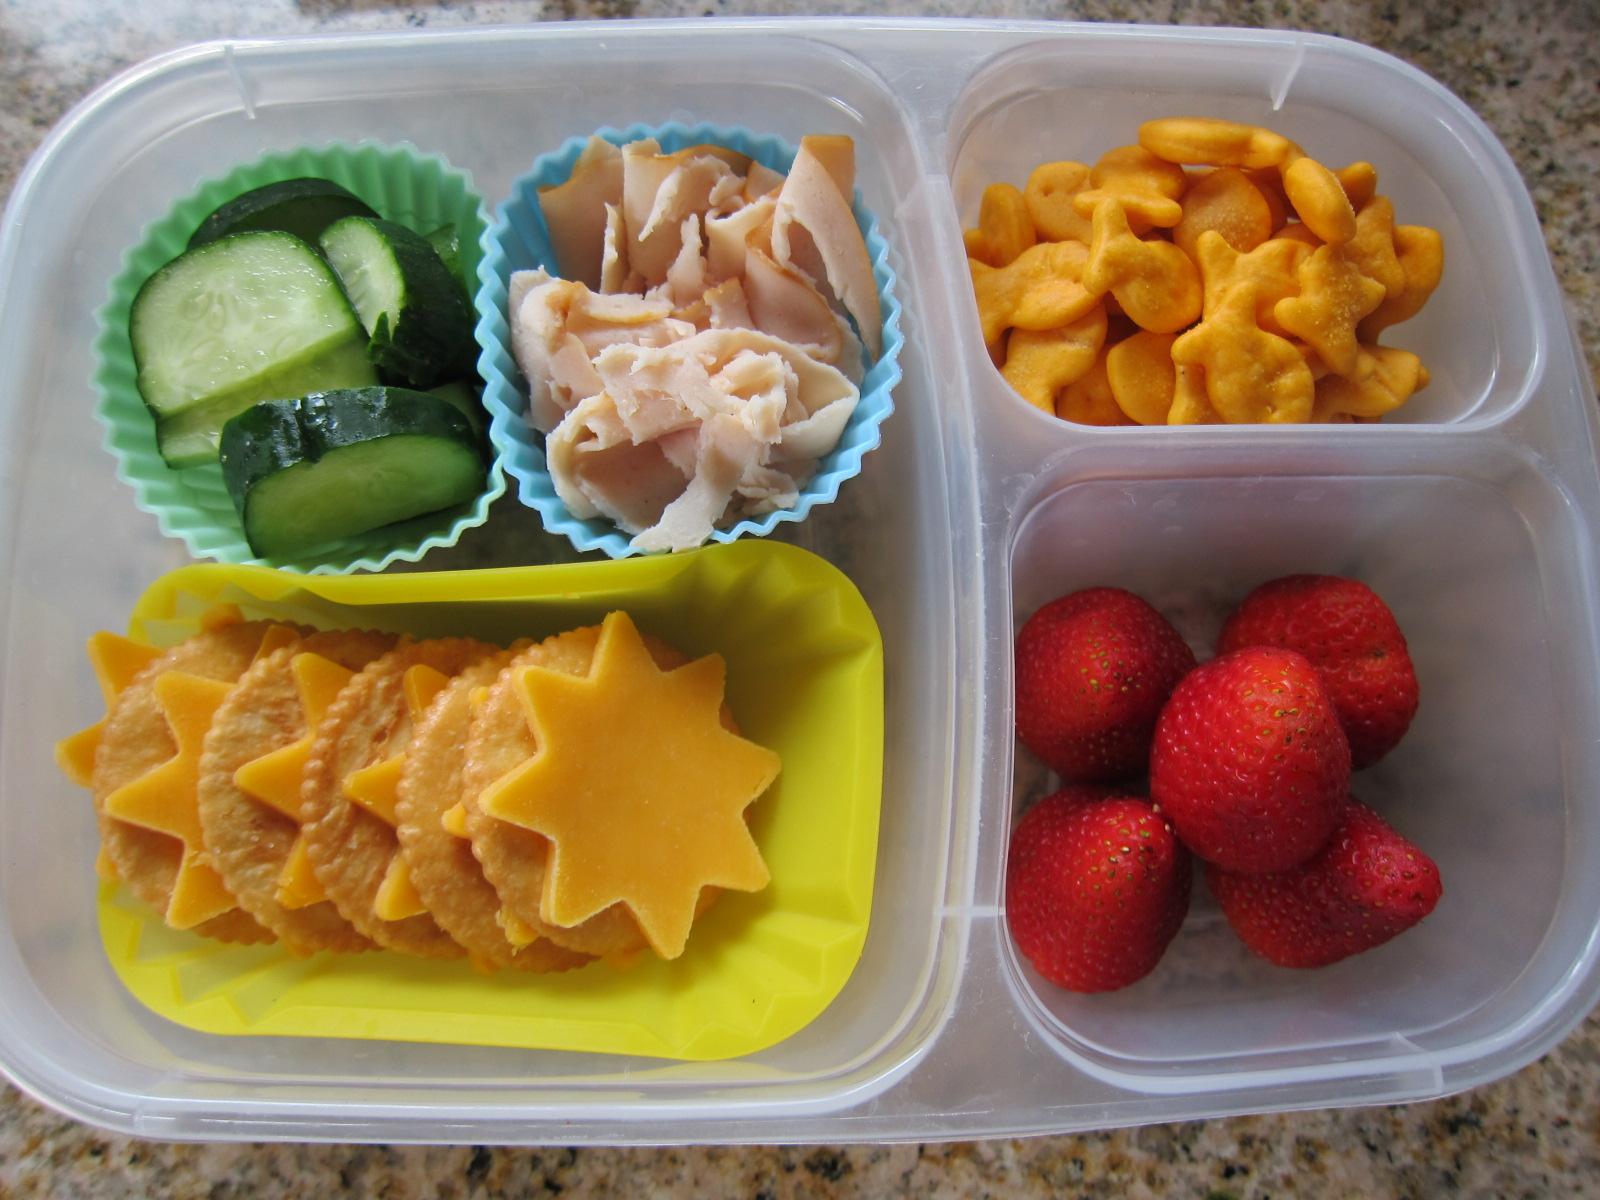 img 2733 - Kindergarten Lunch Ideas